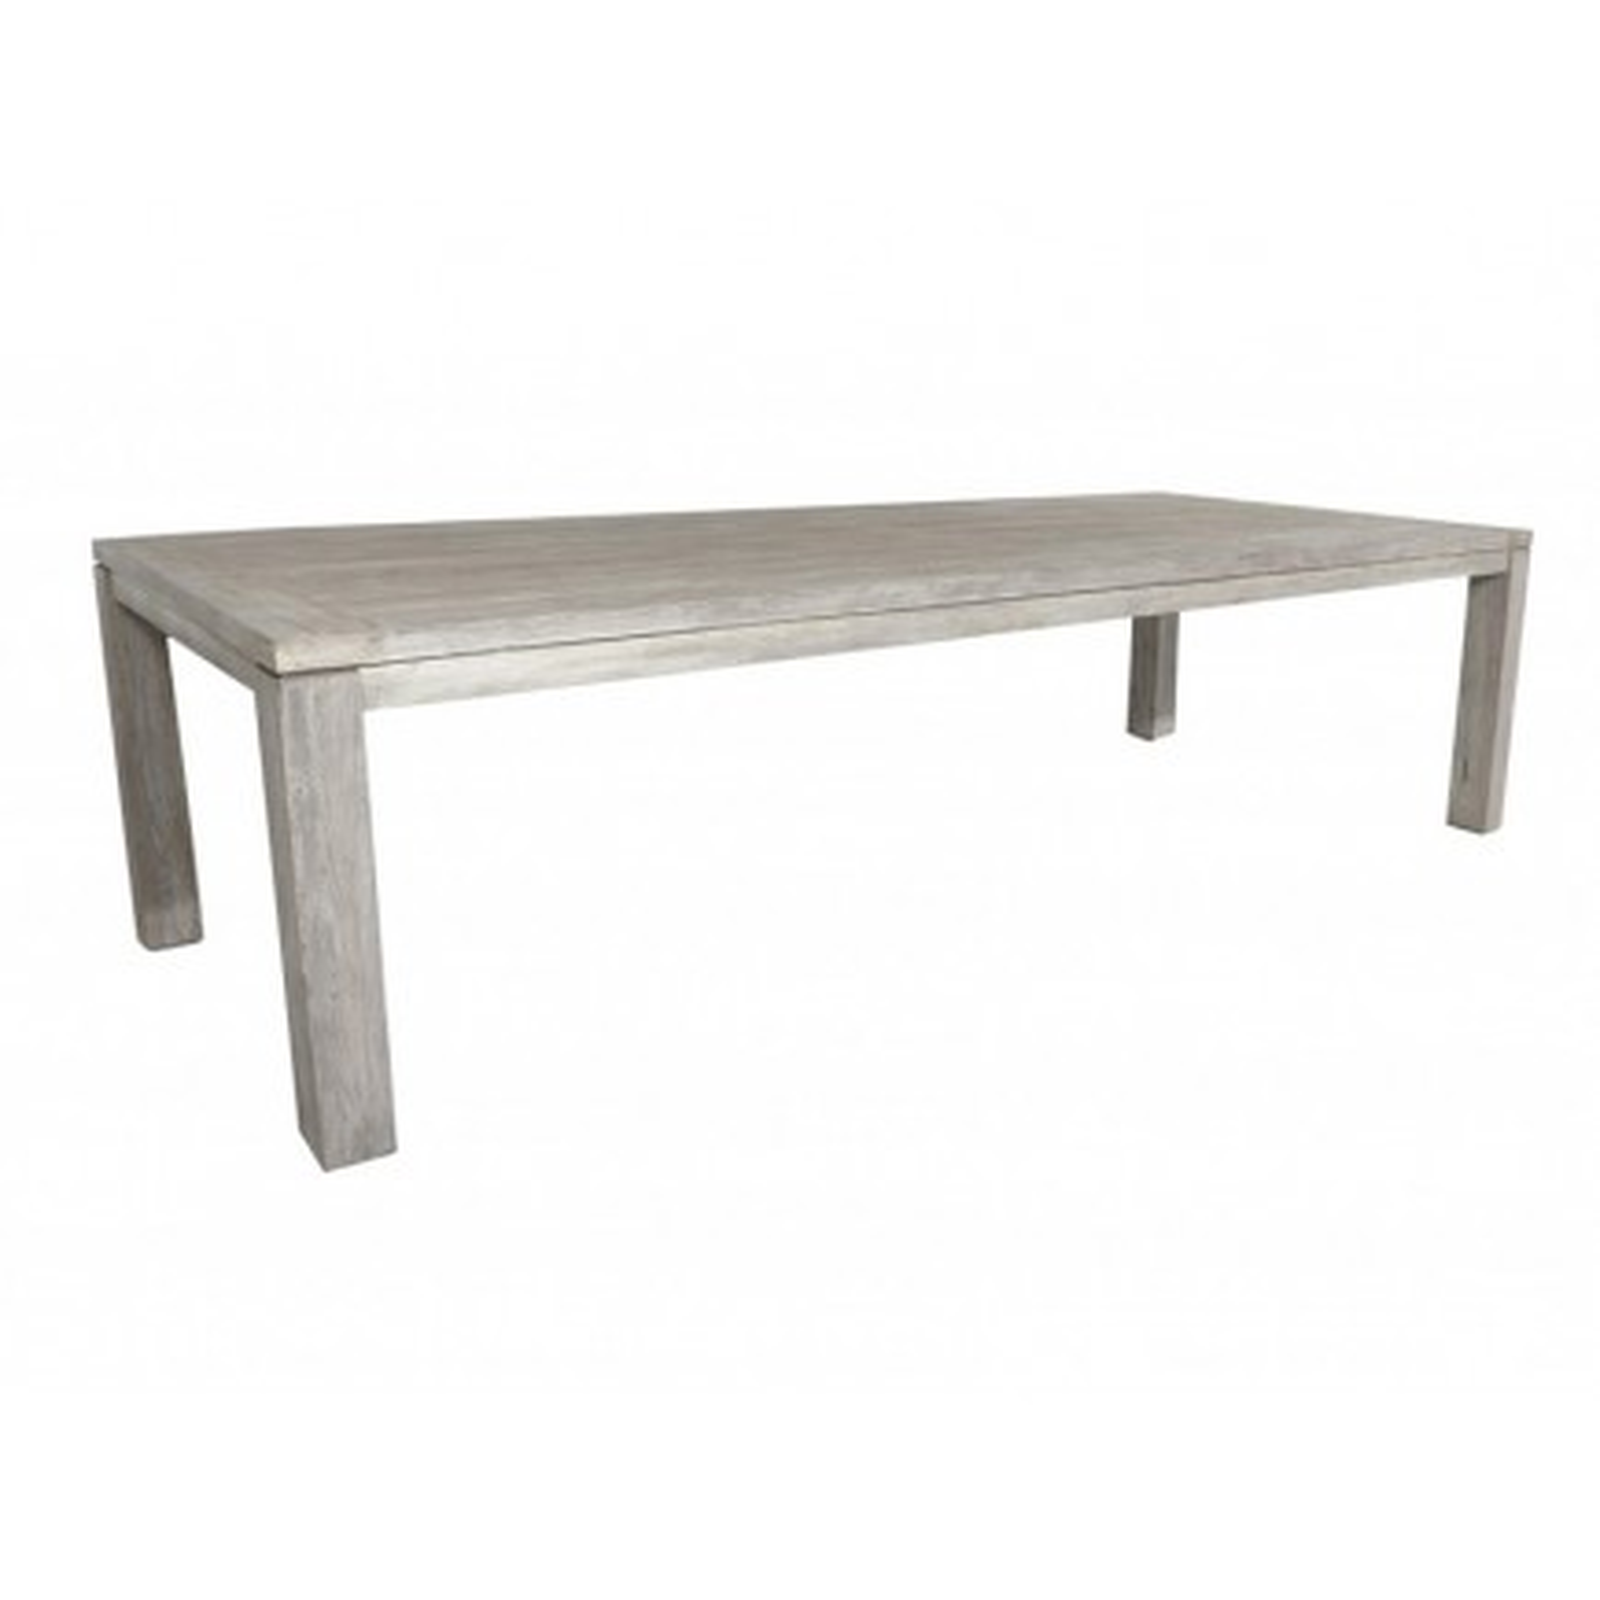 Table De Repas Grisée Taman Teck Massif - meuble de jardin